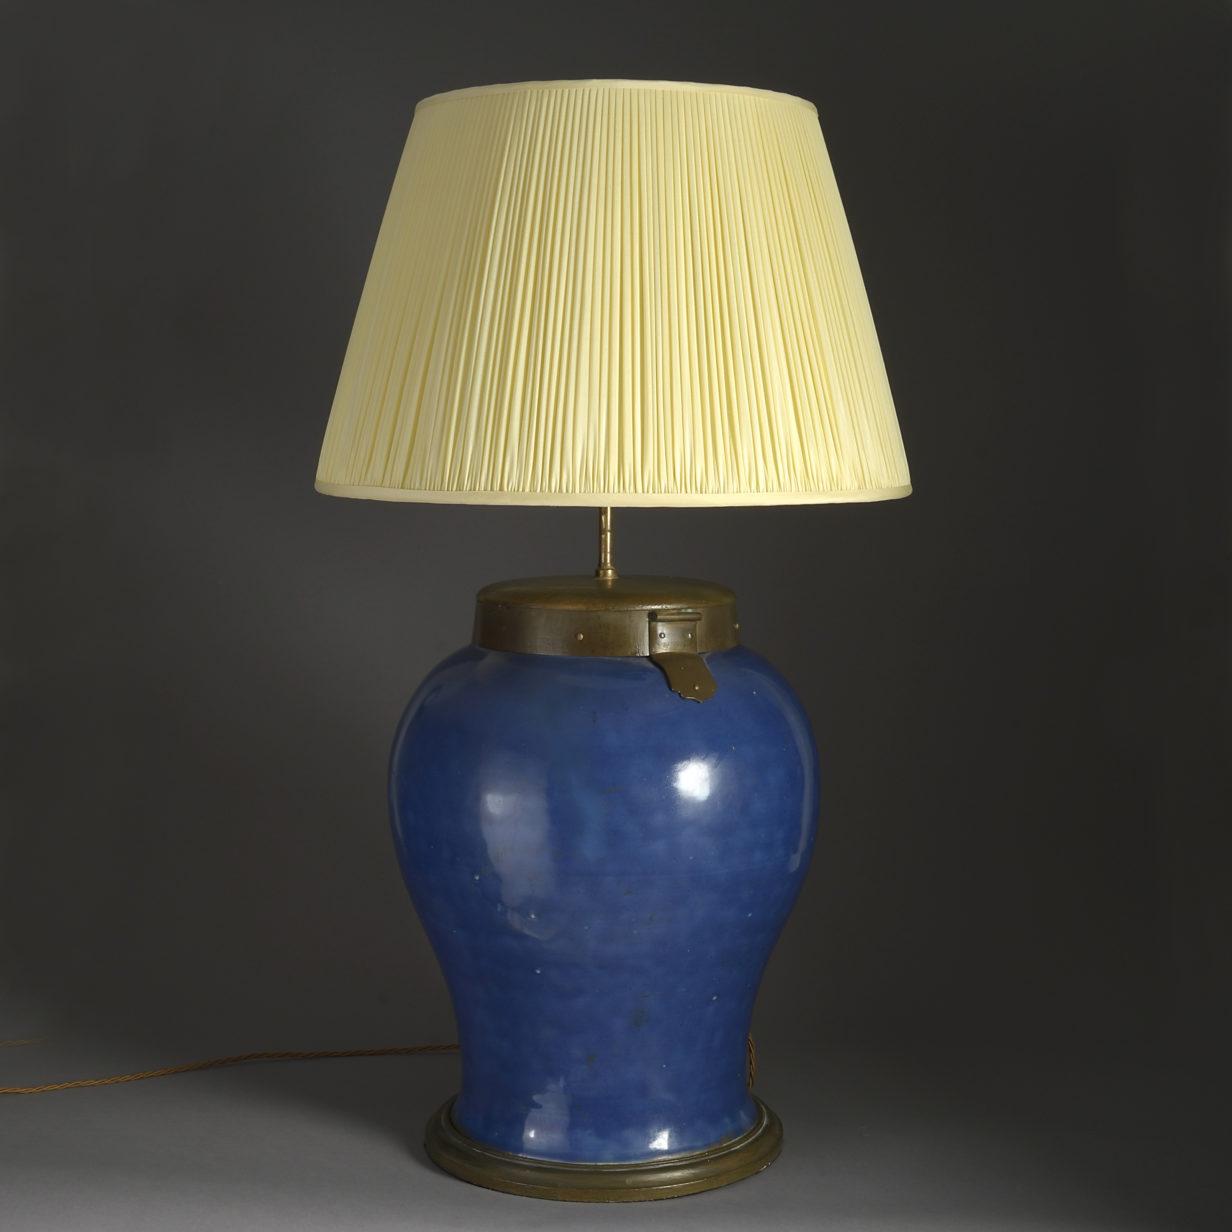 Powder Blue Vase Lamp